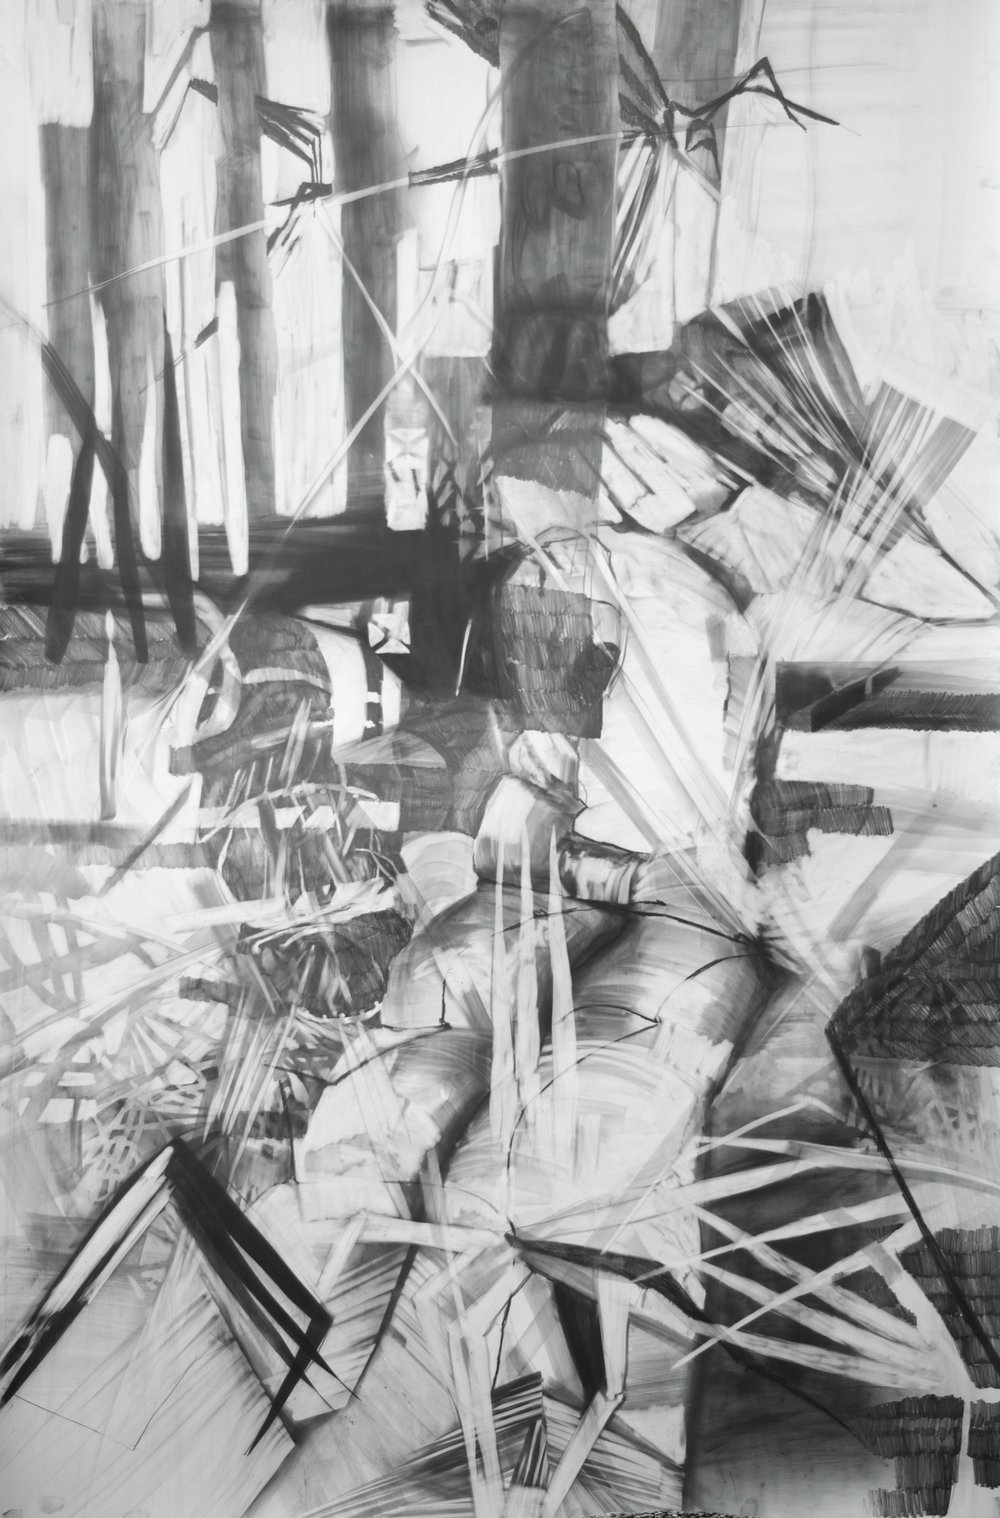 Jill Lavetsky, Serenoa Sea